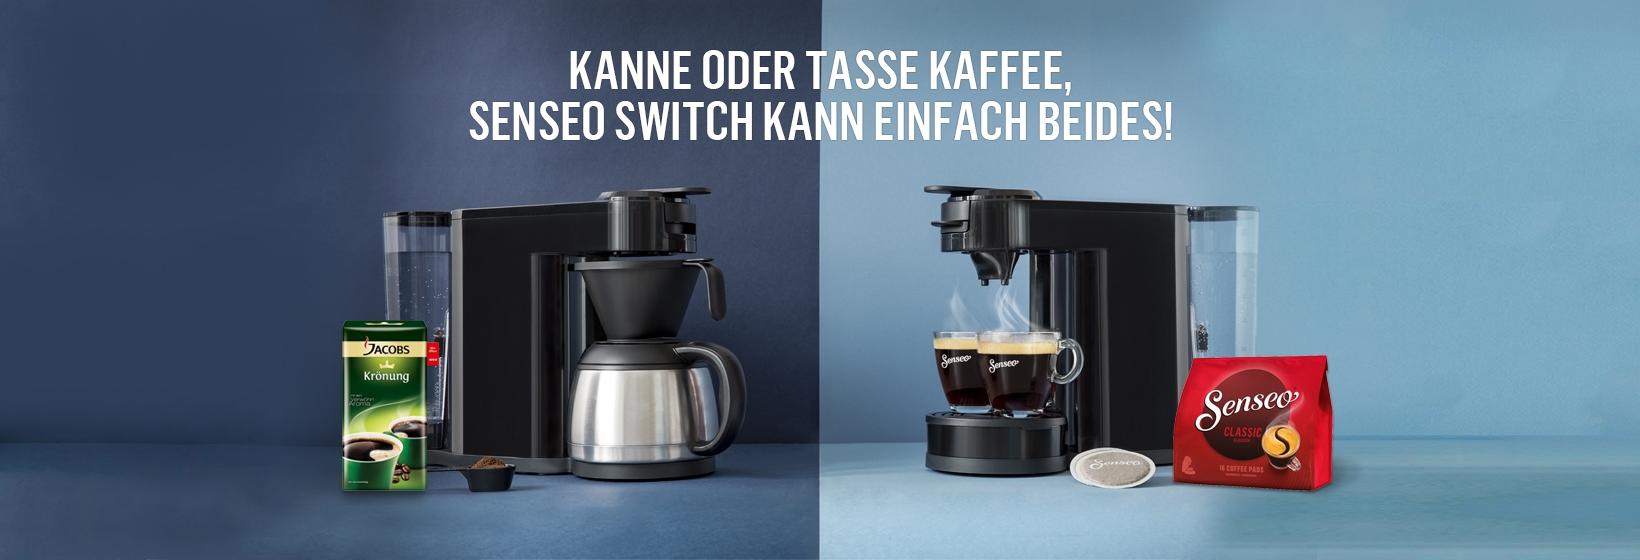 senseo hd7892 60 switch 2 in 1 kaffeemaschine ausstellungsger t. Black Bedroom Furniture Sets. Home Design Ideas